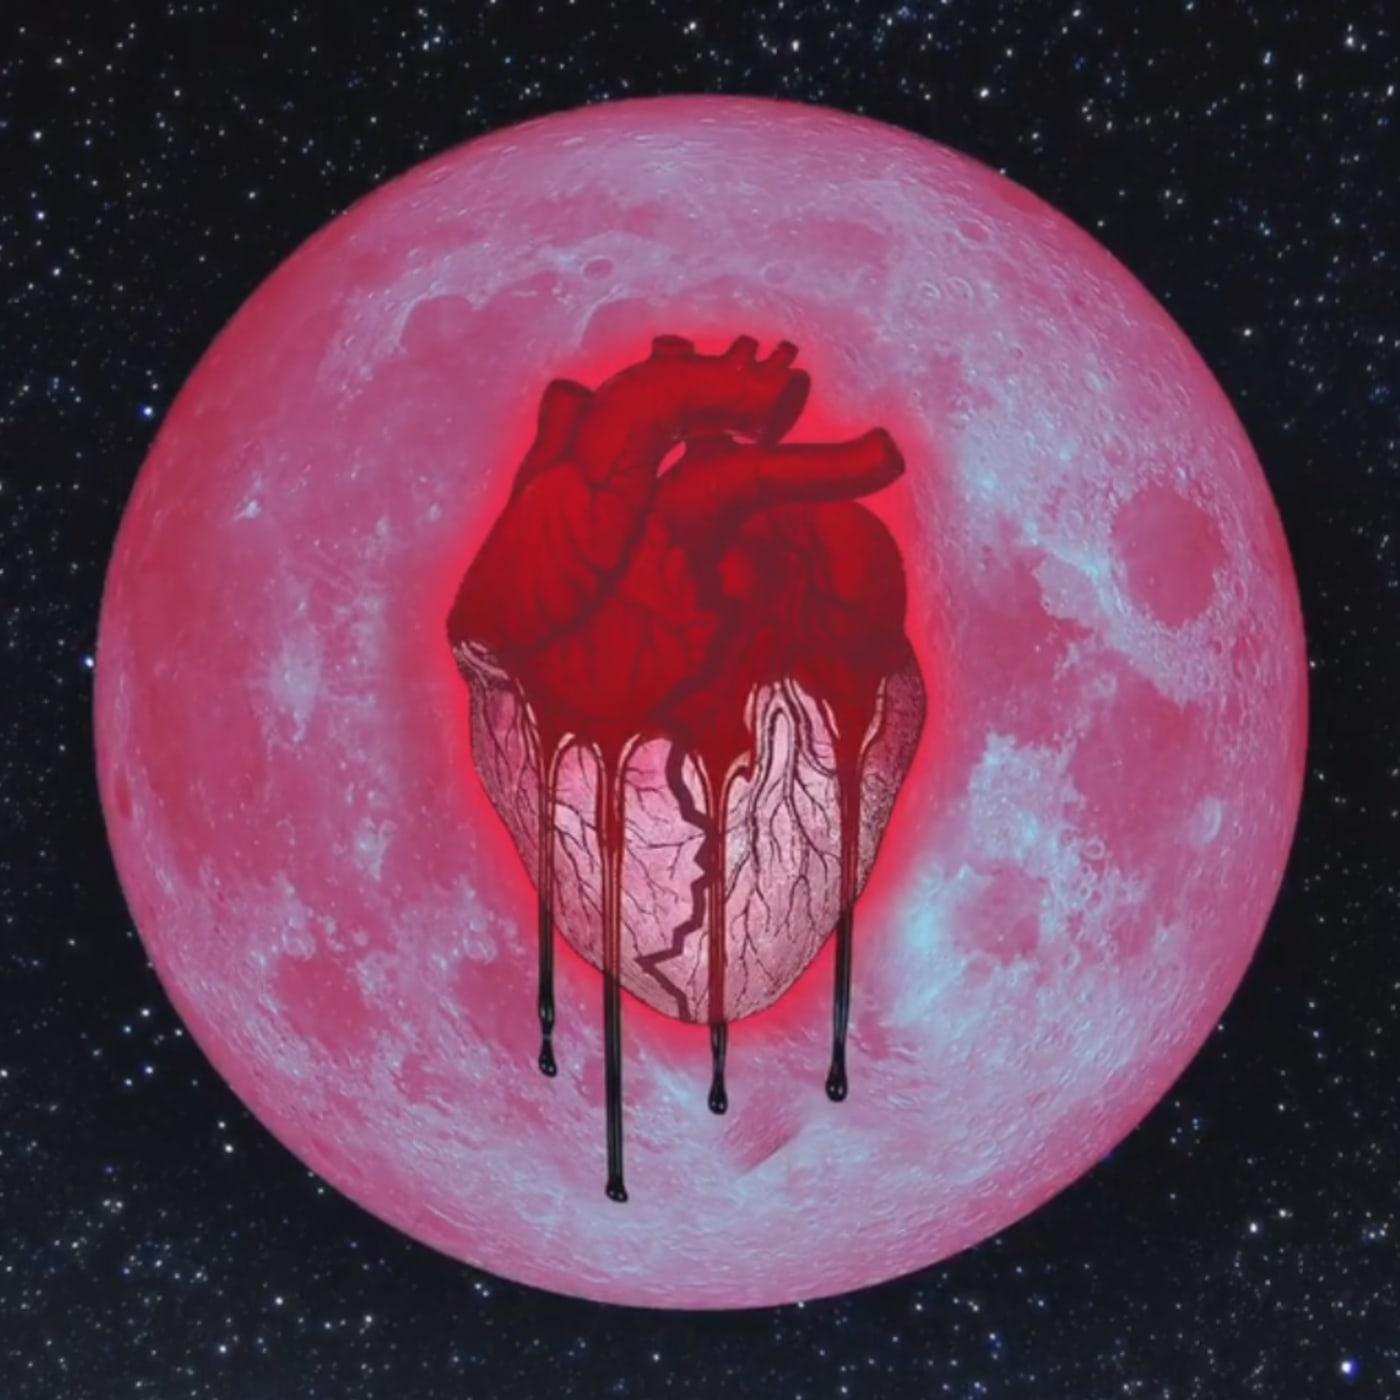 Chris Brown's 'Heartbreak on a Full Moon' cover.